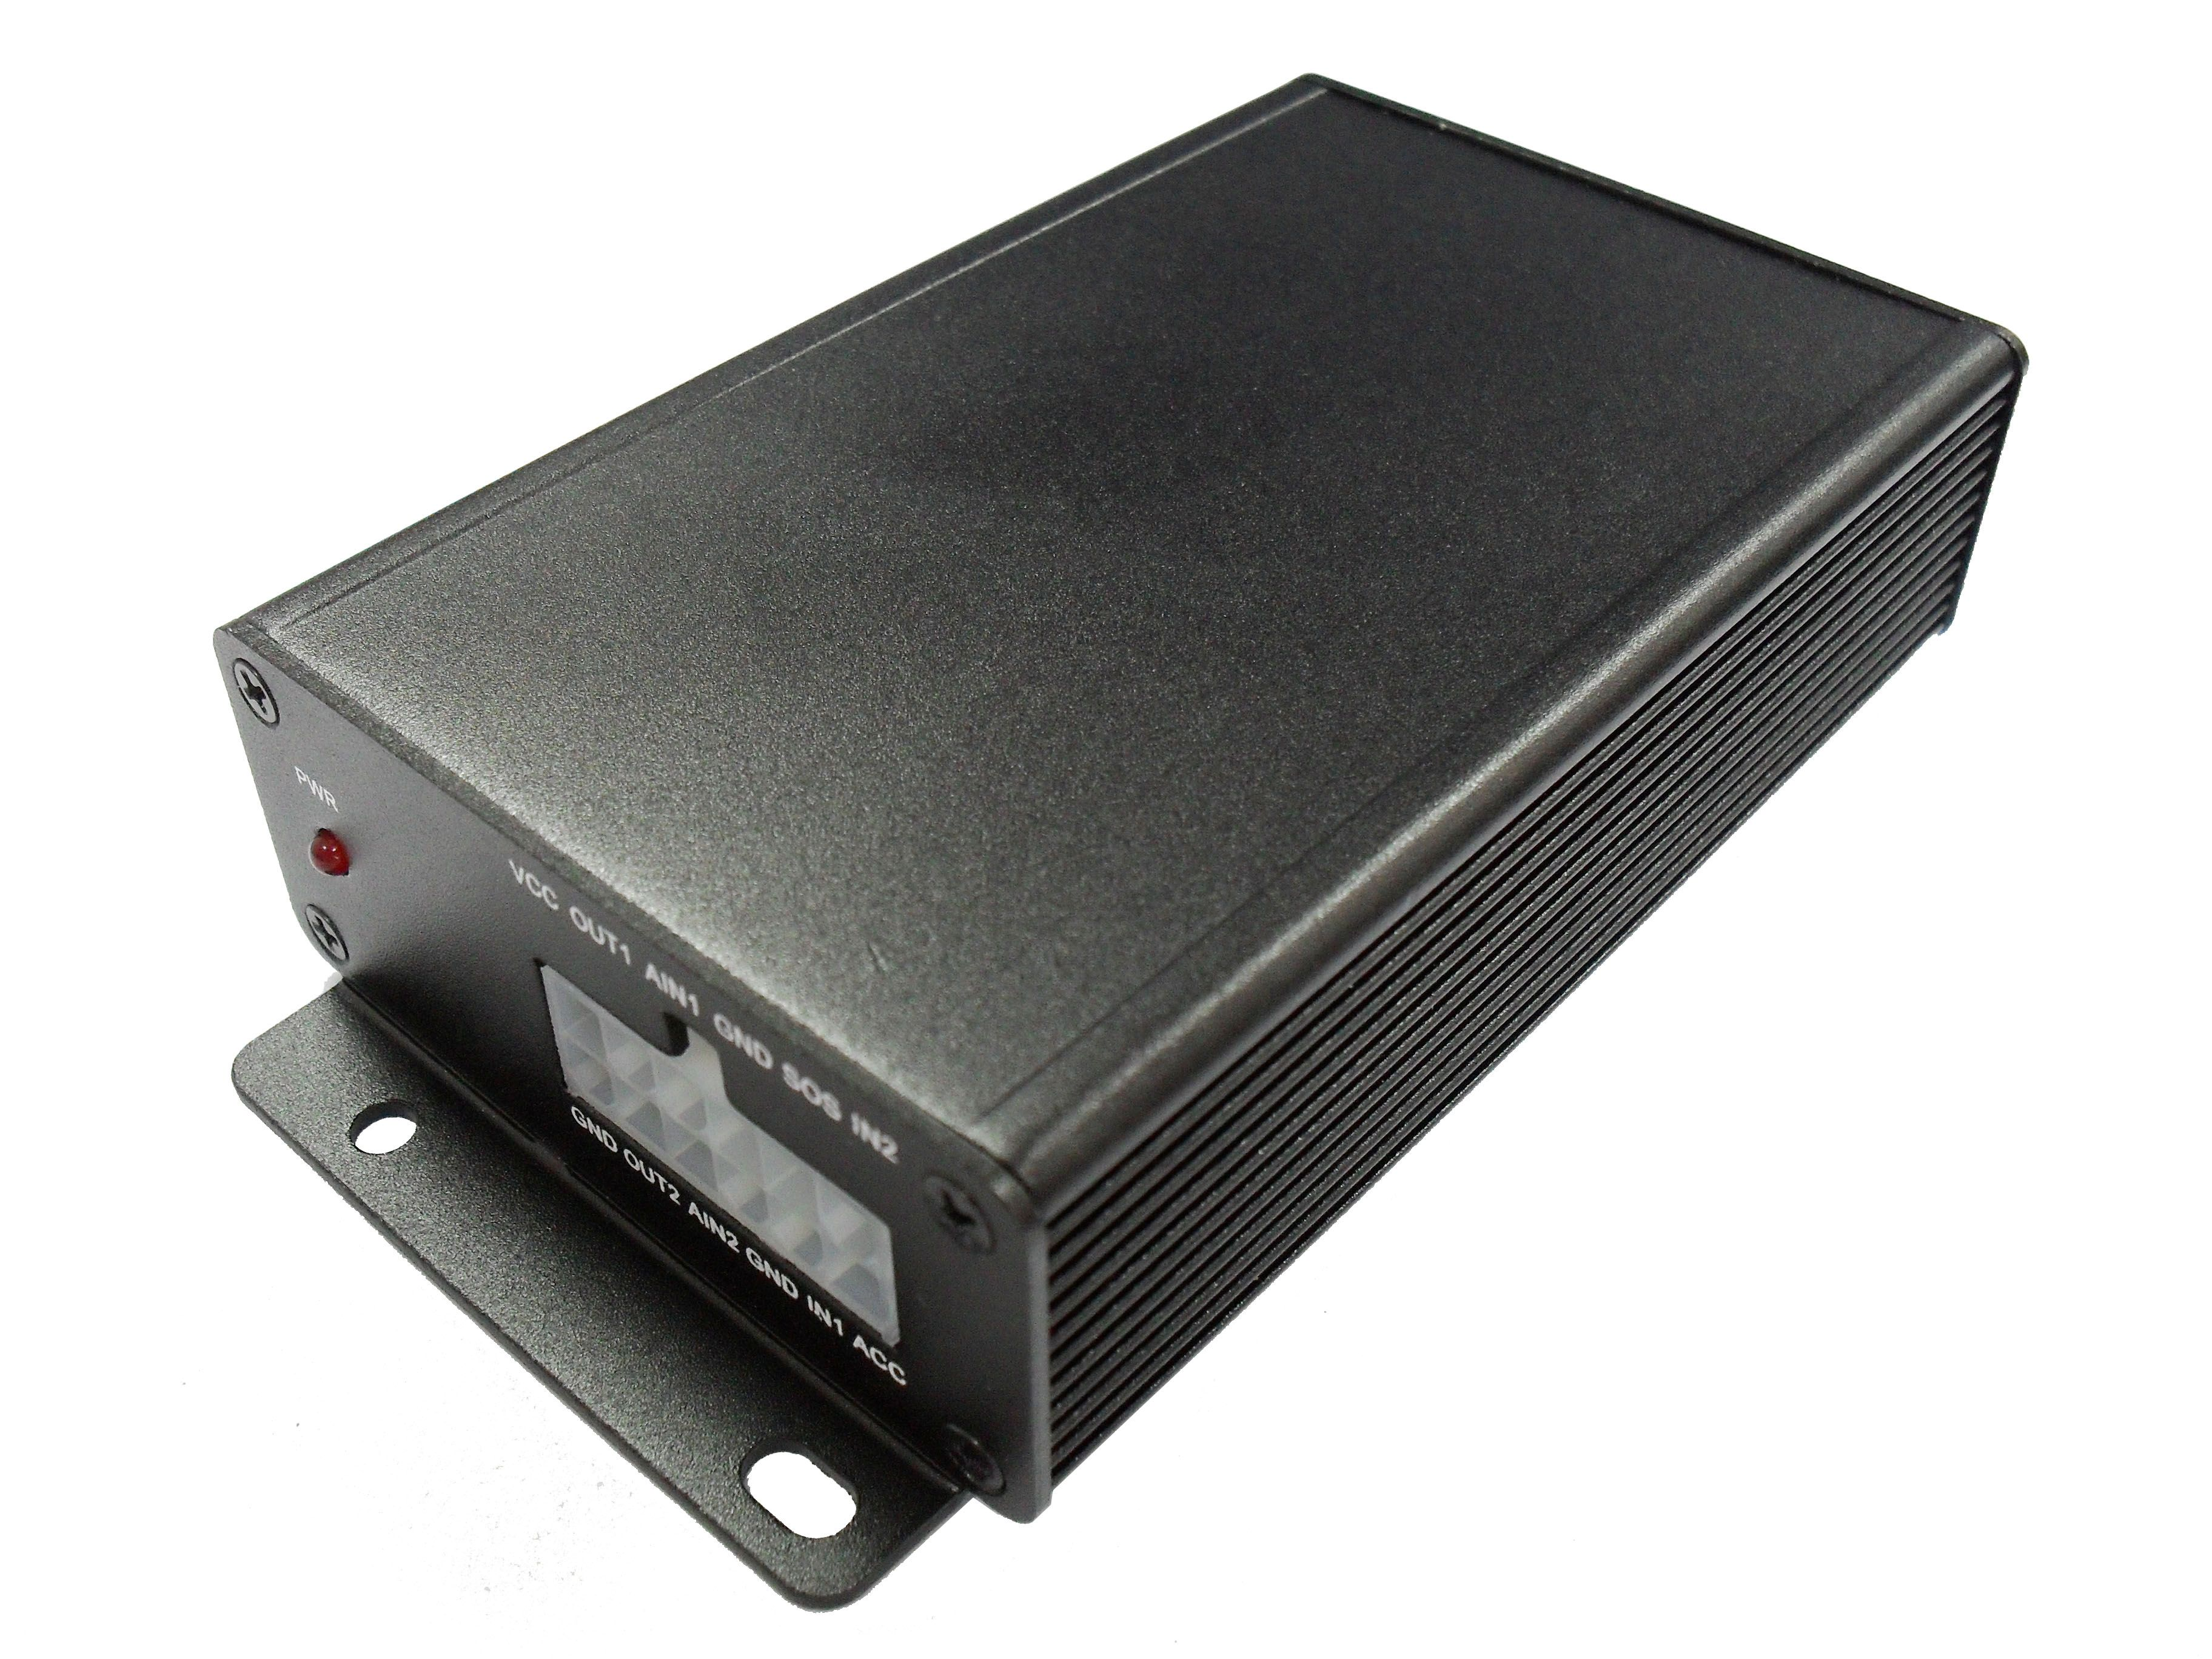 GVT-510